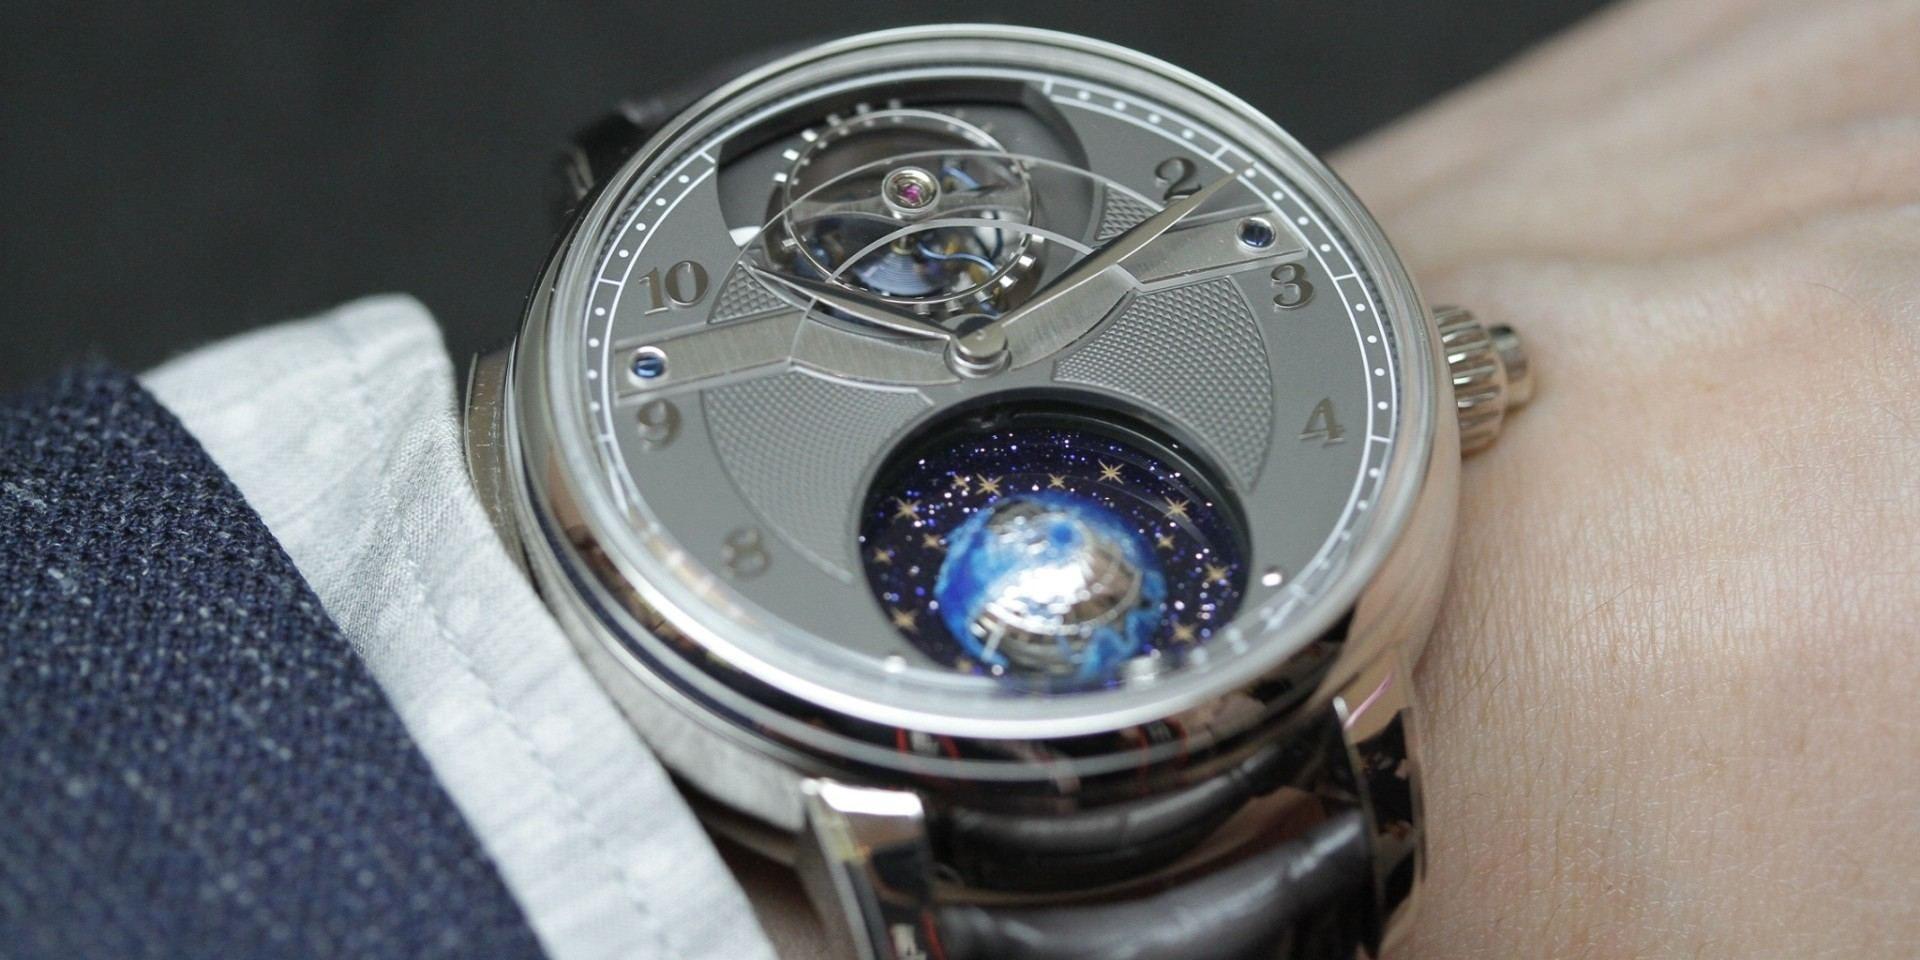 【SIHH 2019錶展報導】萬寶龍推出獨一無二腕錶―Star Legacy系列蛻變限量款8(附價格)